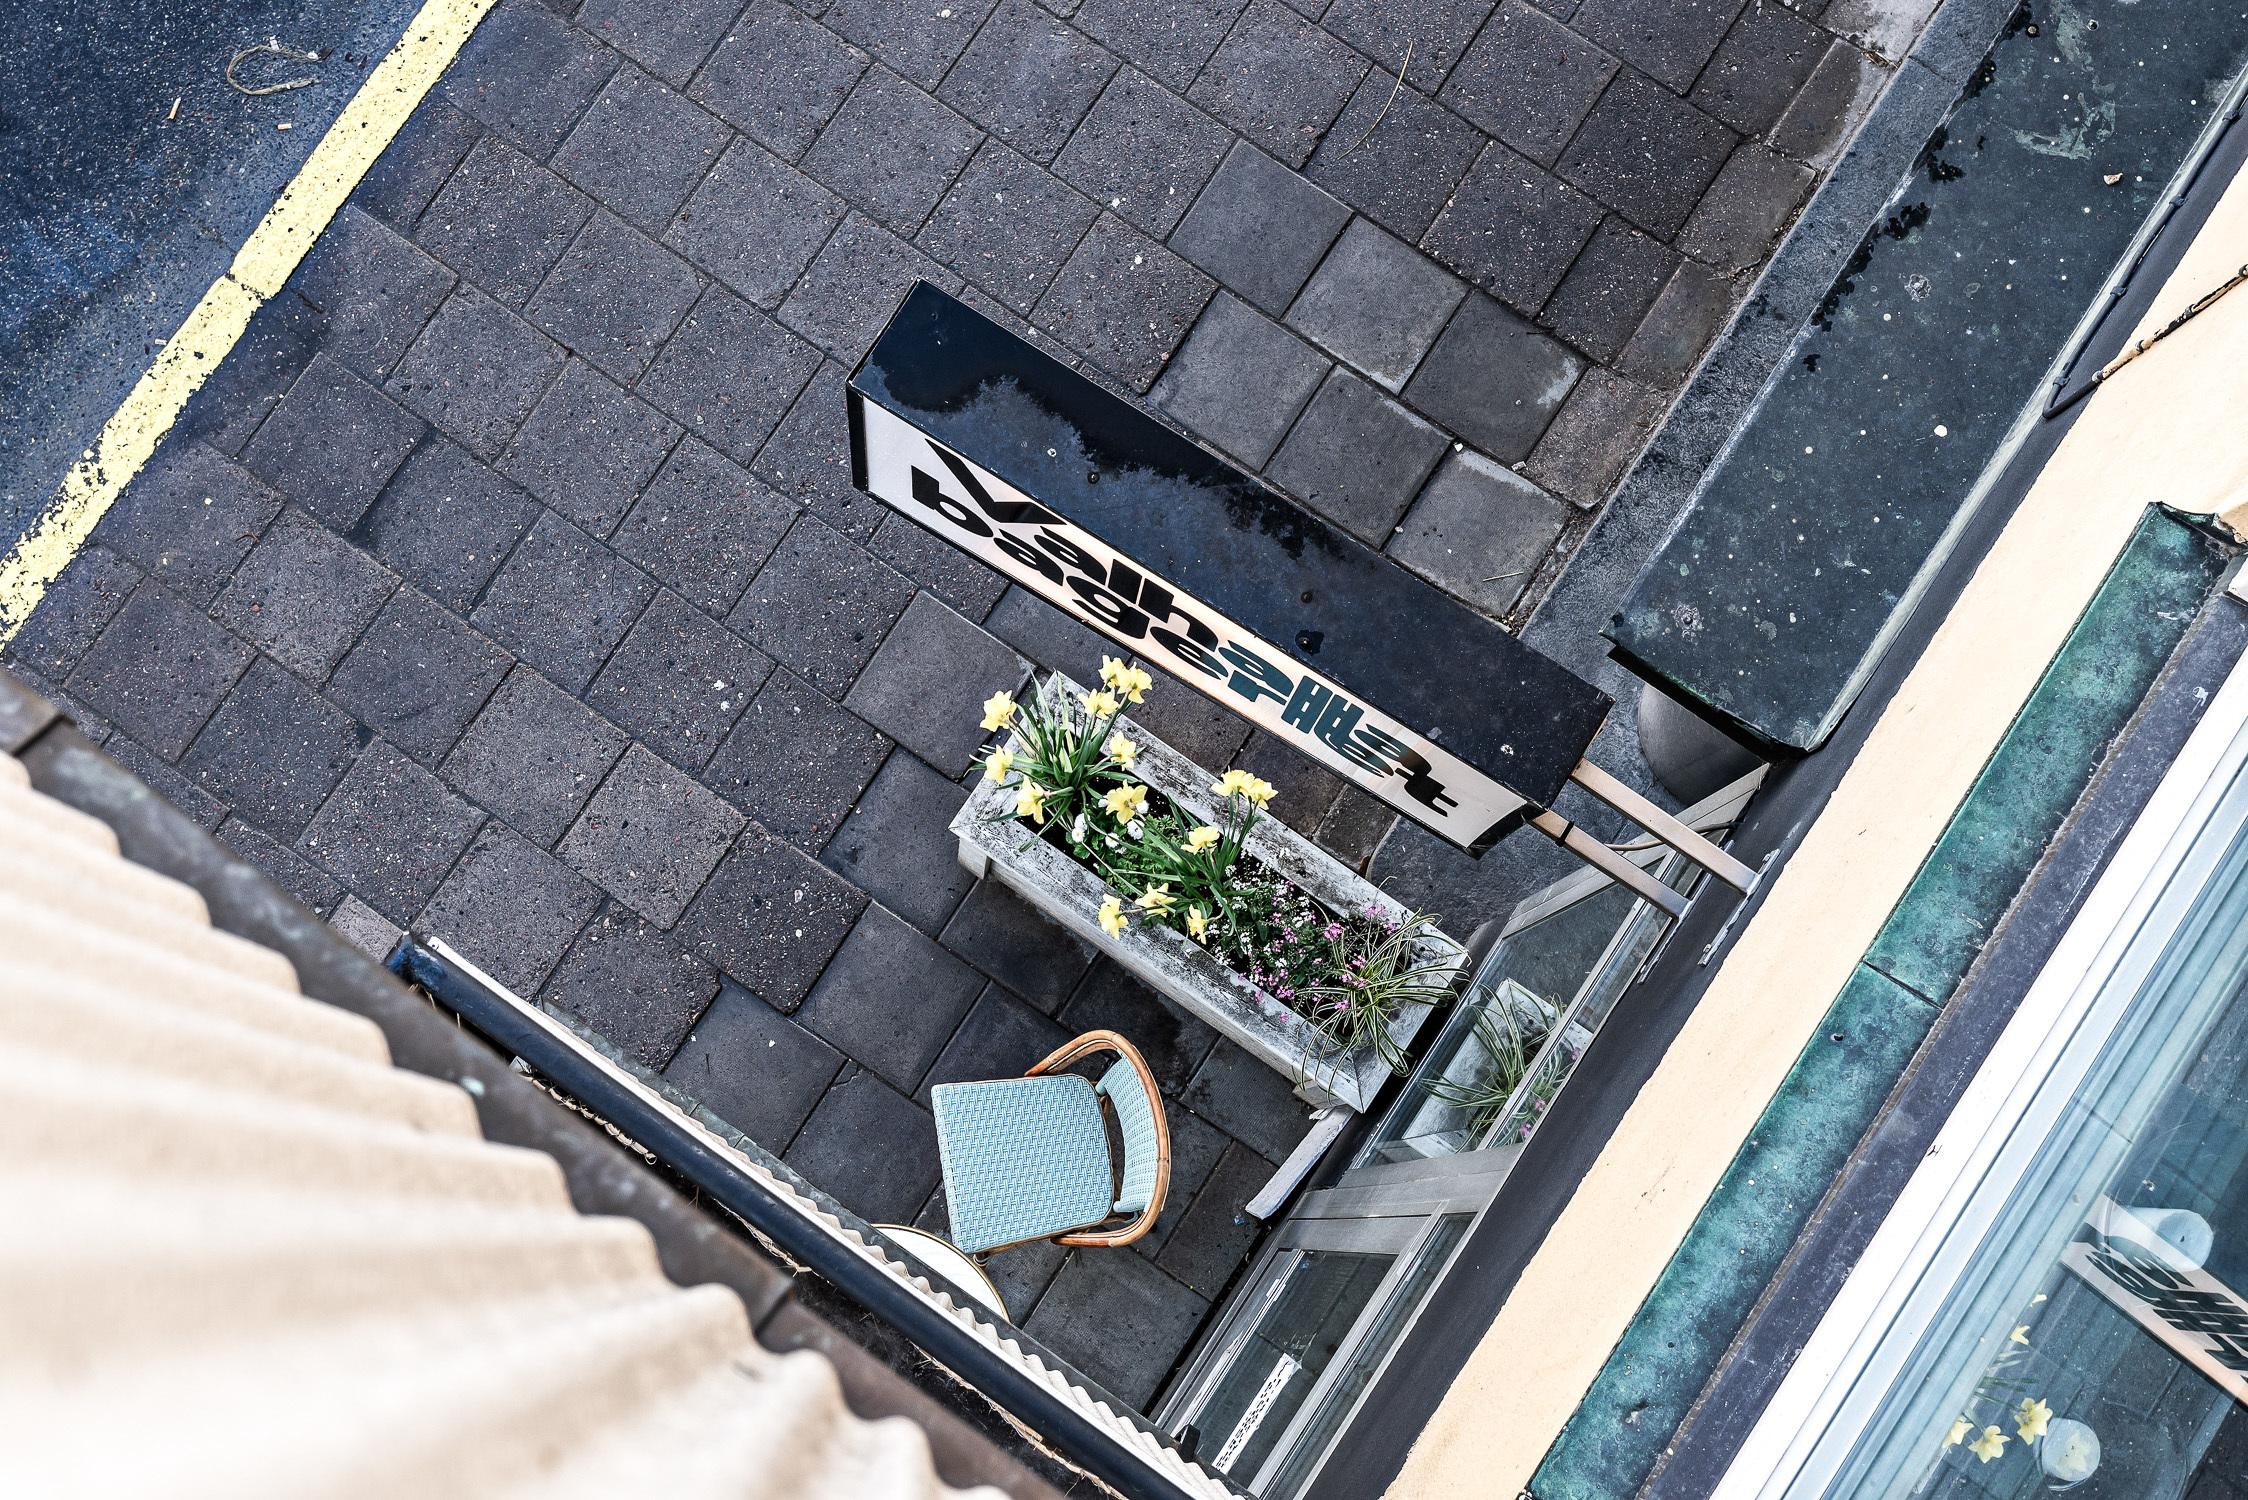 Valhallabageri från balkongen